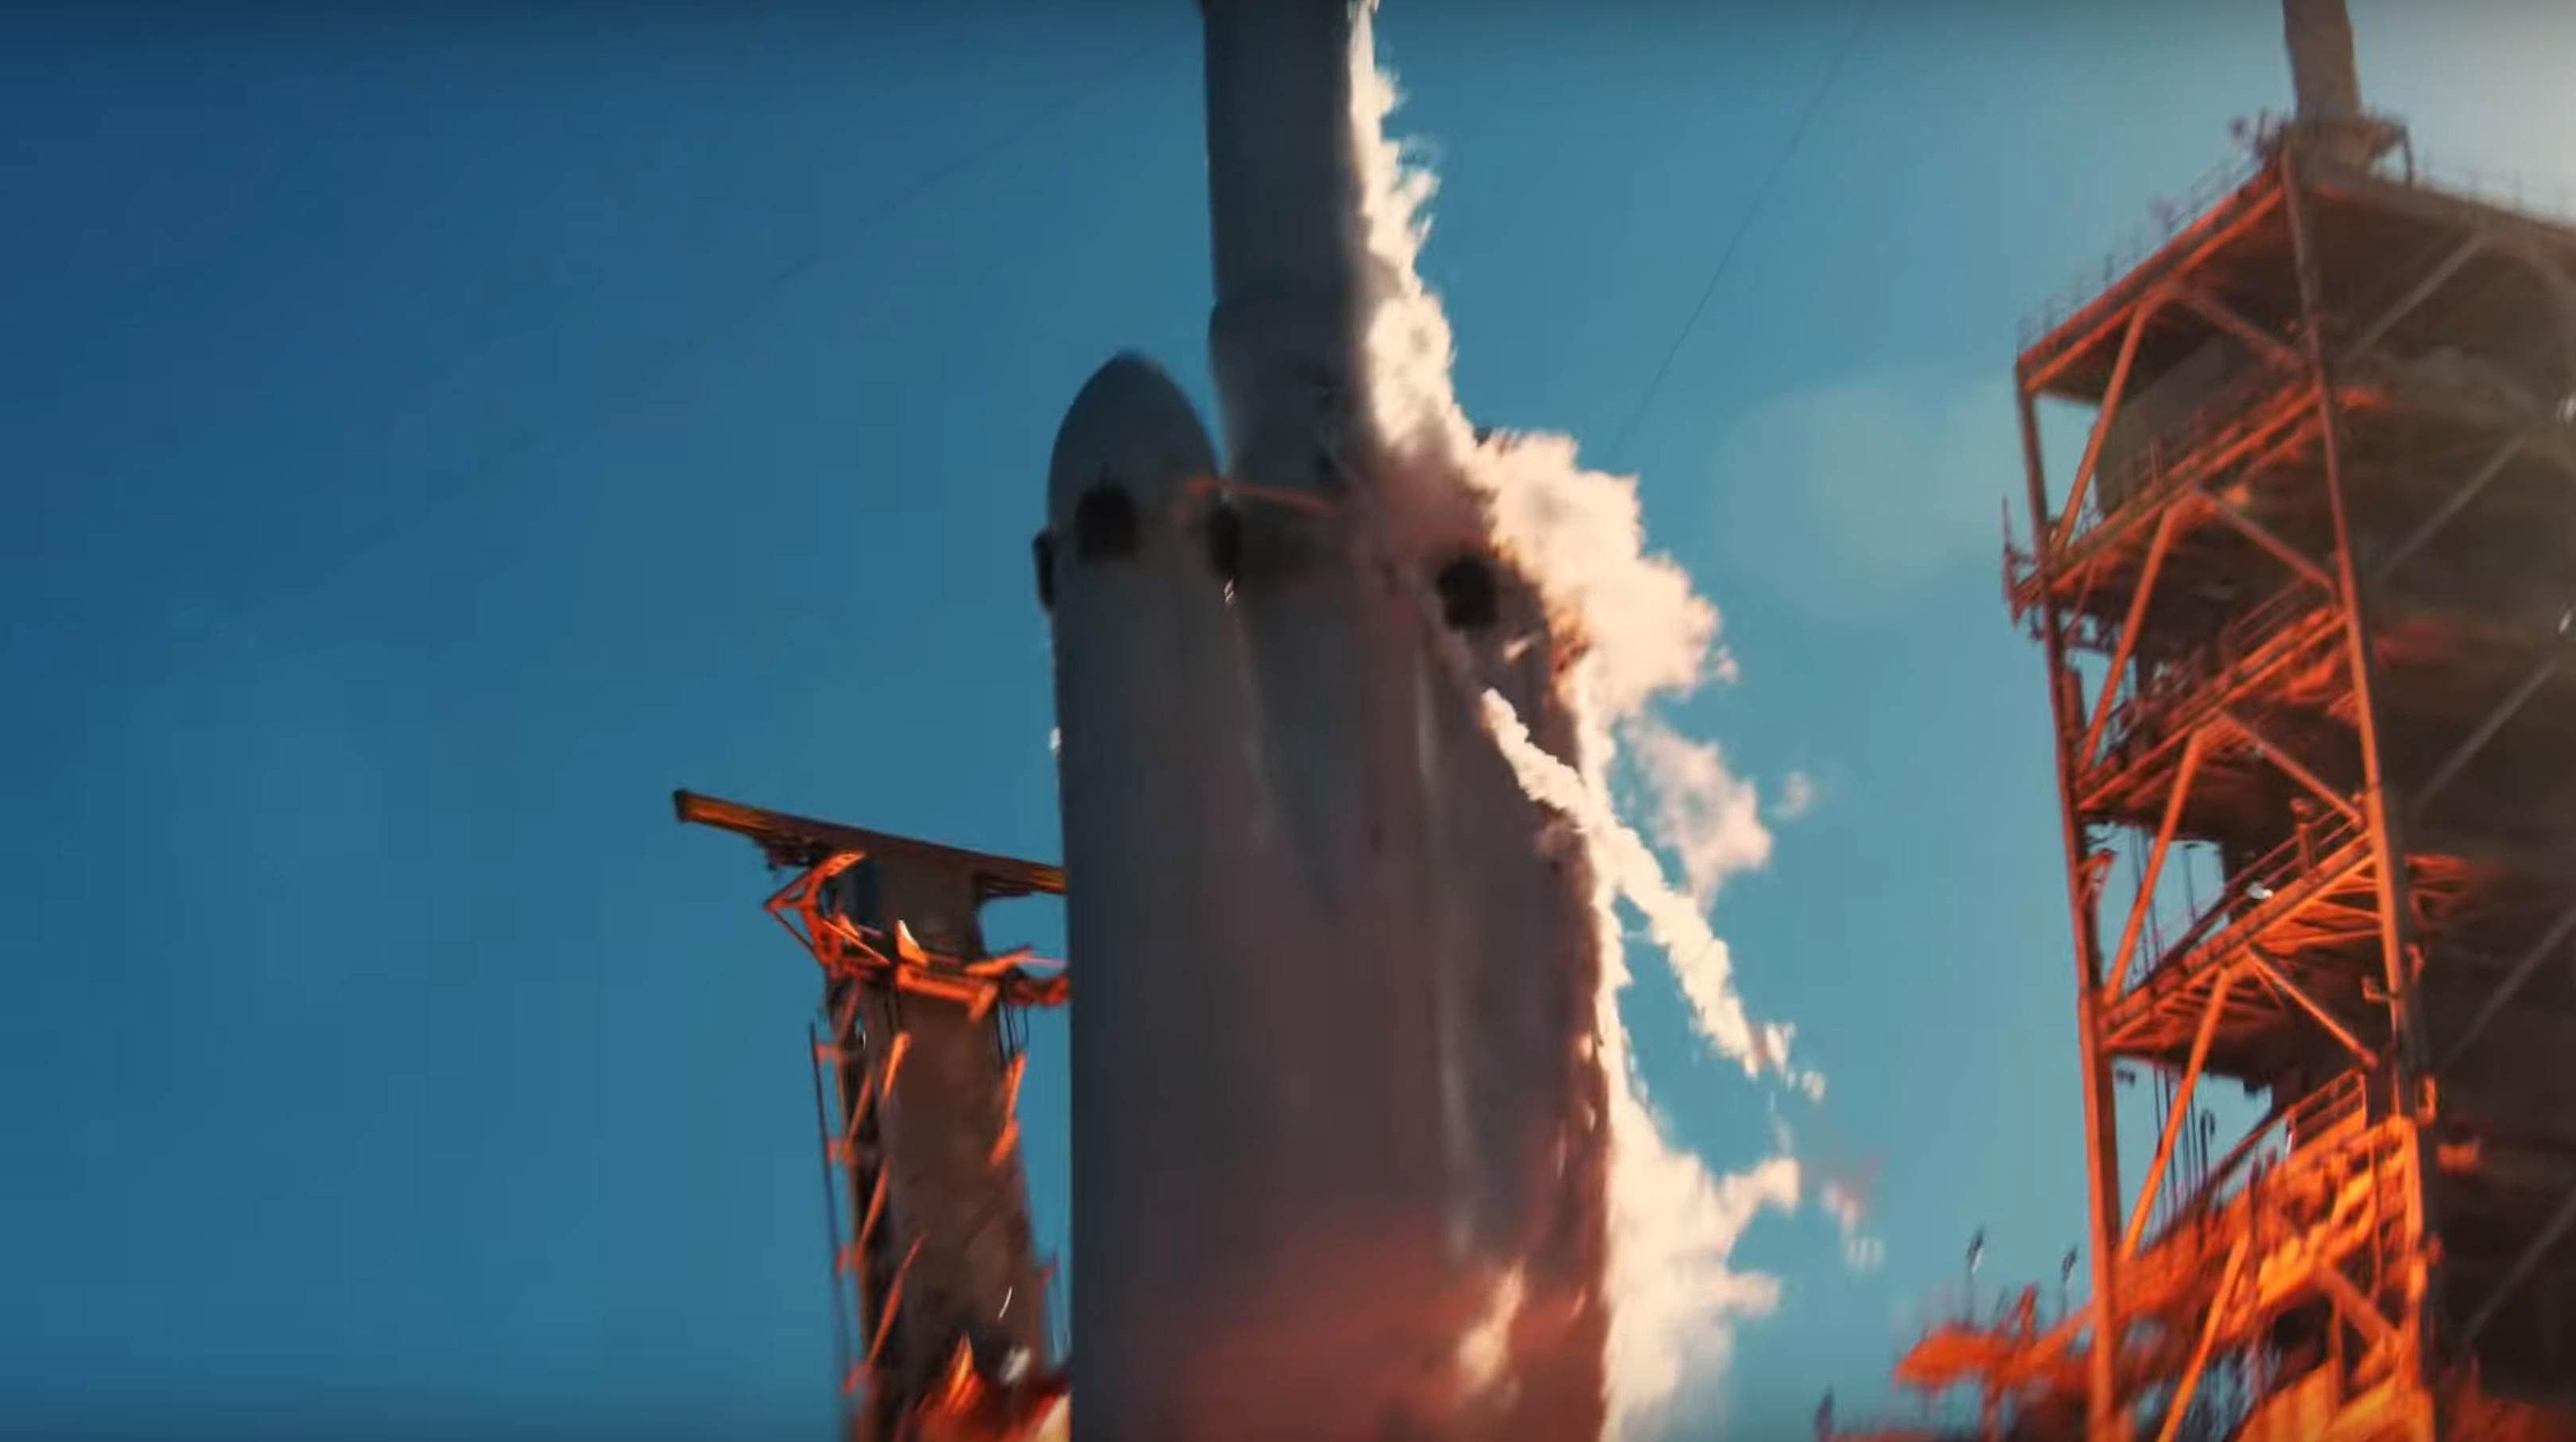 Falcon Heavy Flight 1 liftoff (SpaceX) 4